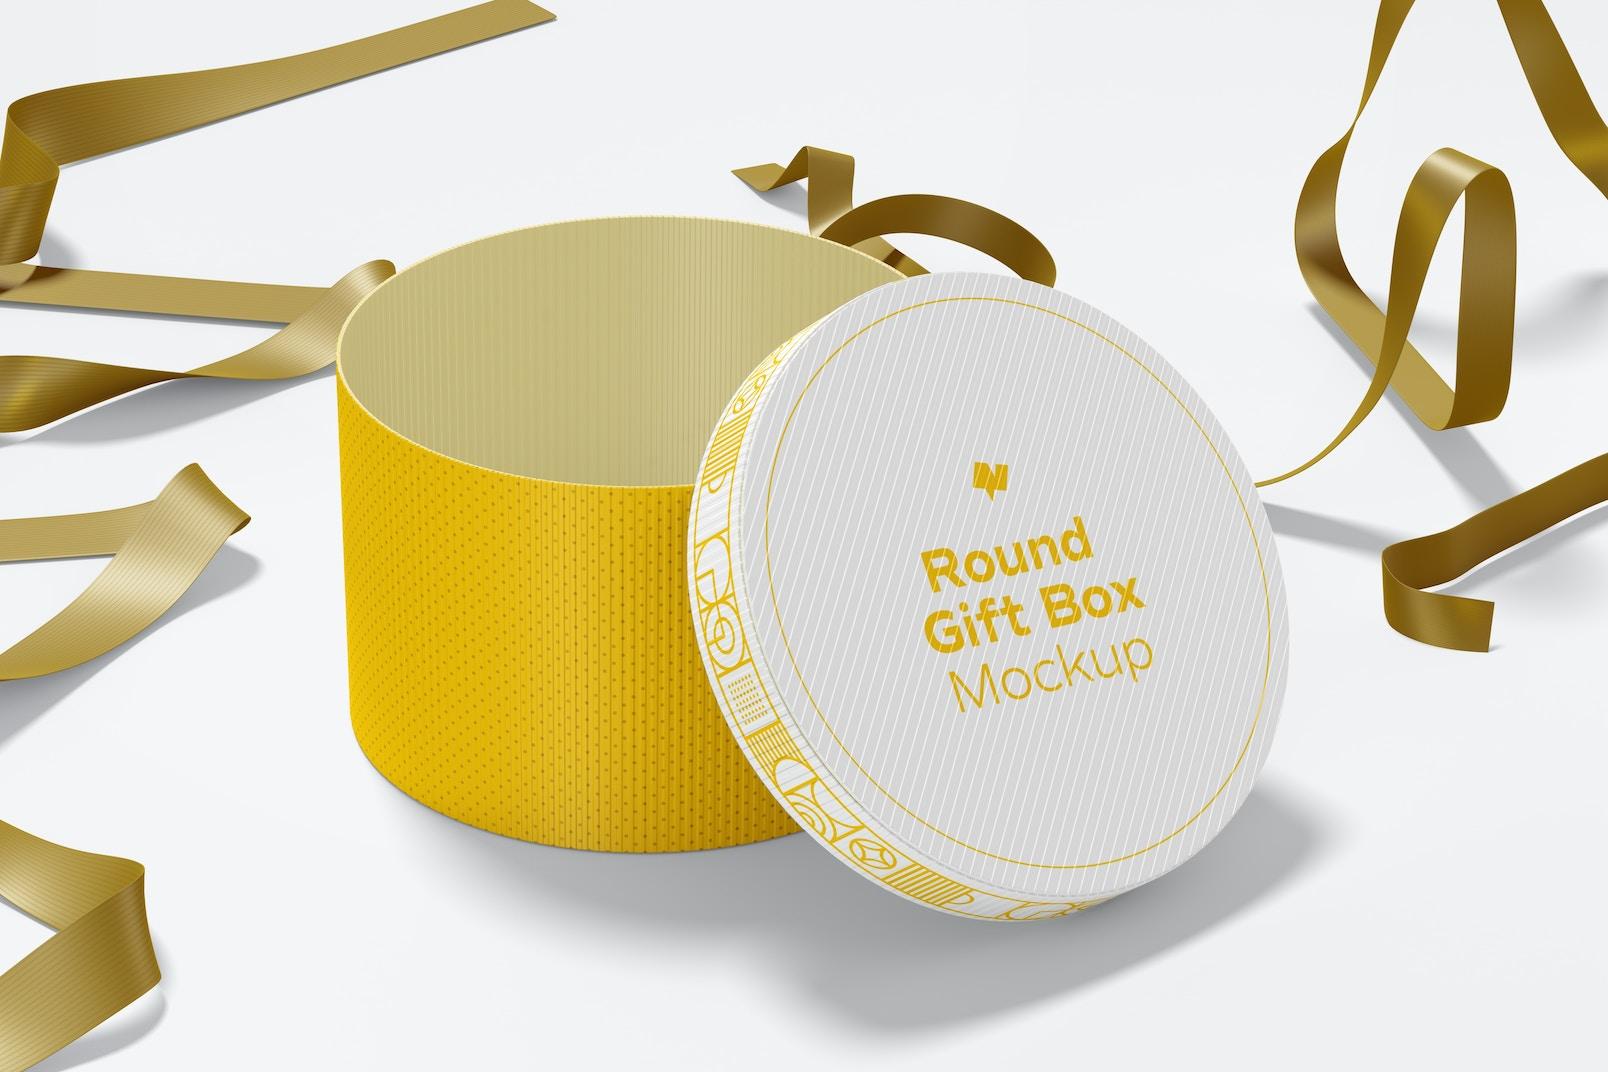 Round Gift Box with Ribbon Mockup, Opened